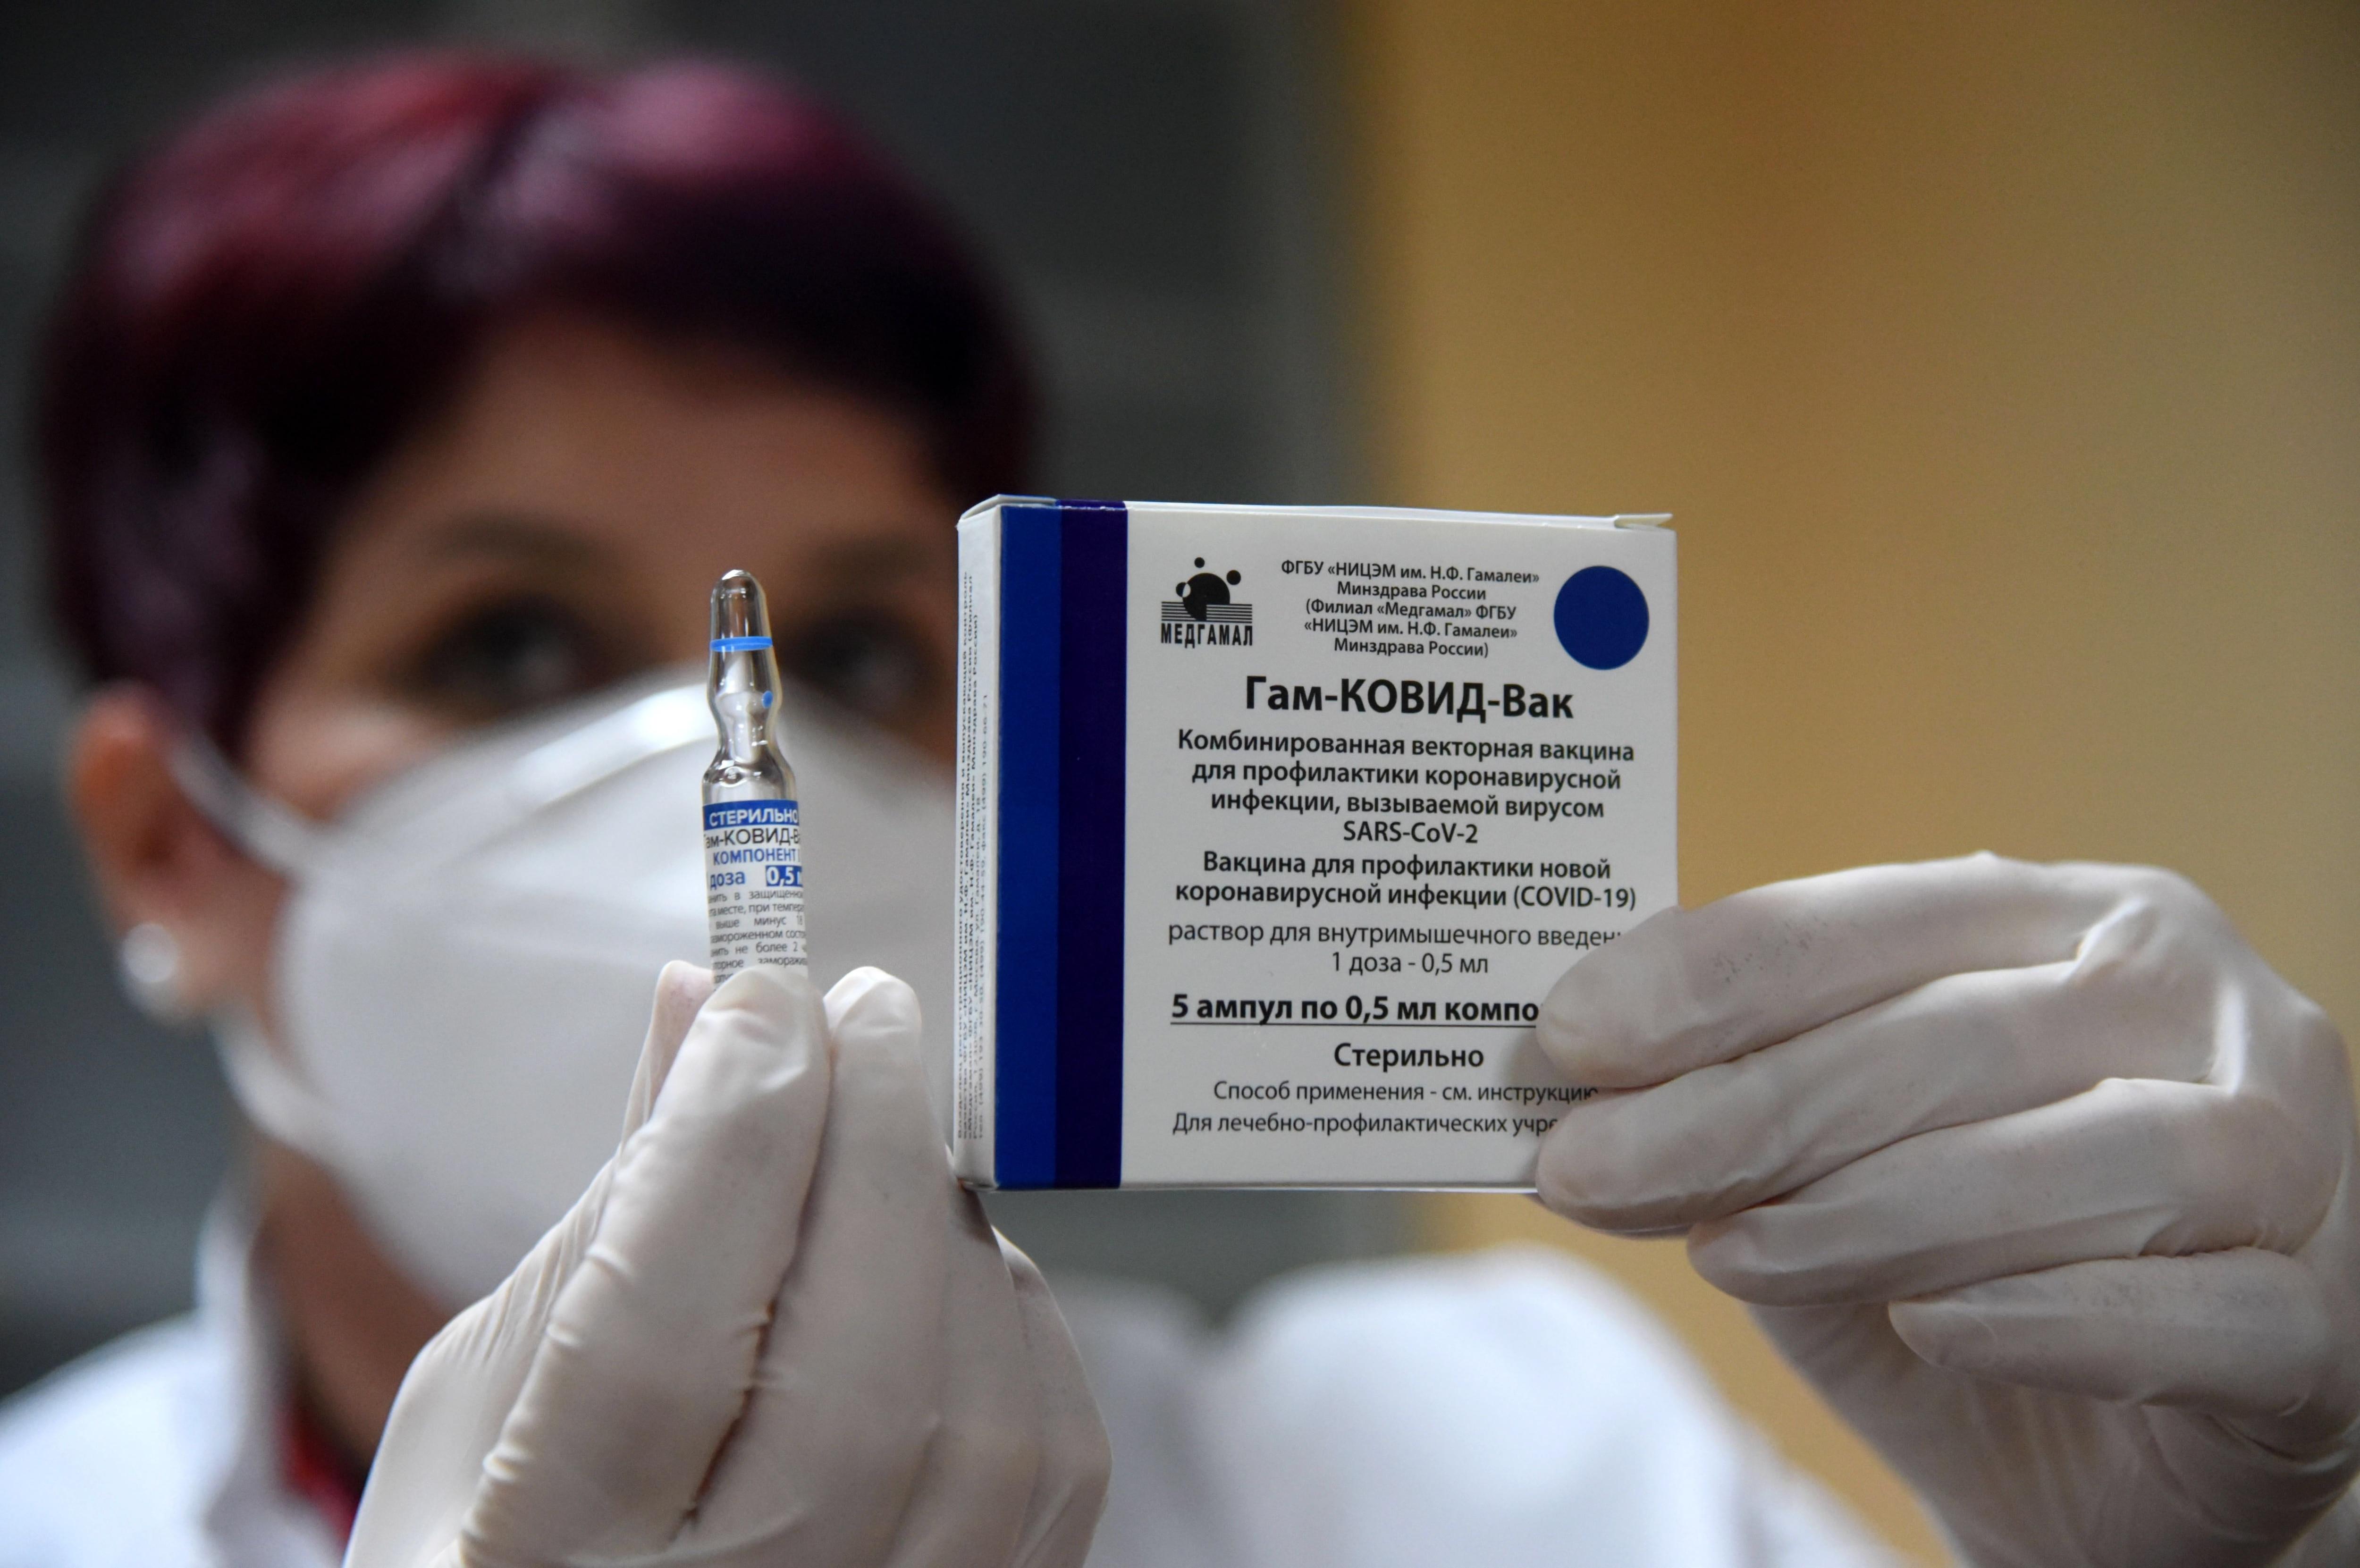 Enfermera enseña una dosis de Sputnik V. EFE/EPA/BORIS PEJOVIC/ Archivo